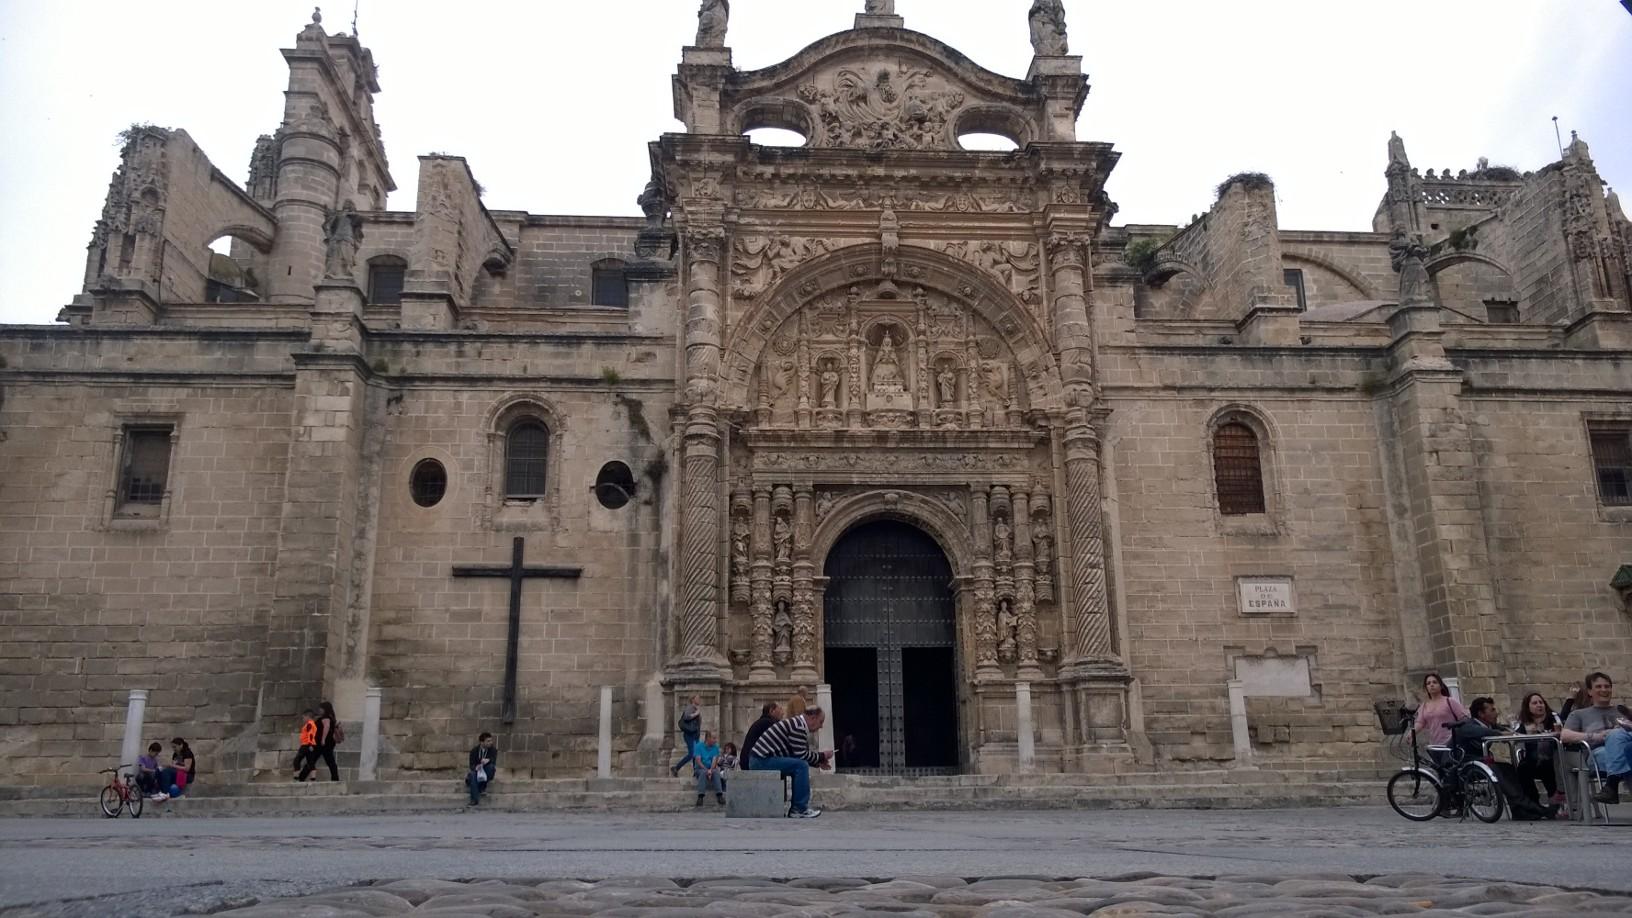 Iglesia de San Marcos, en la plaza de España